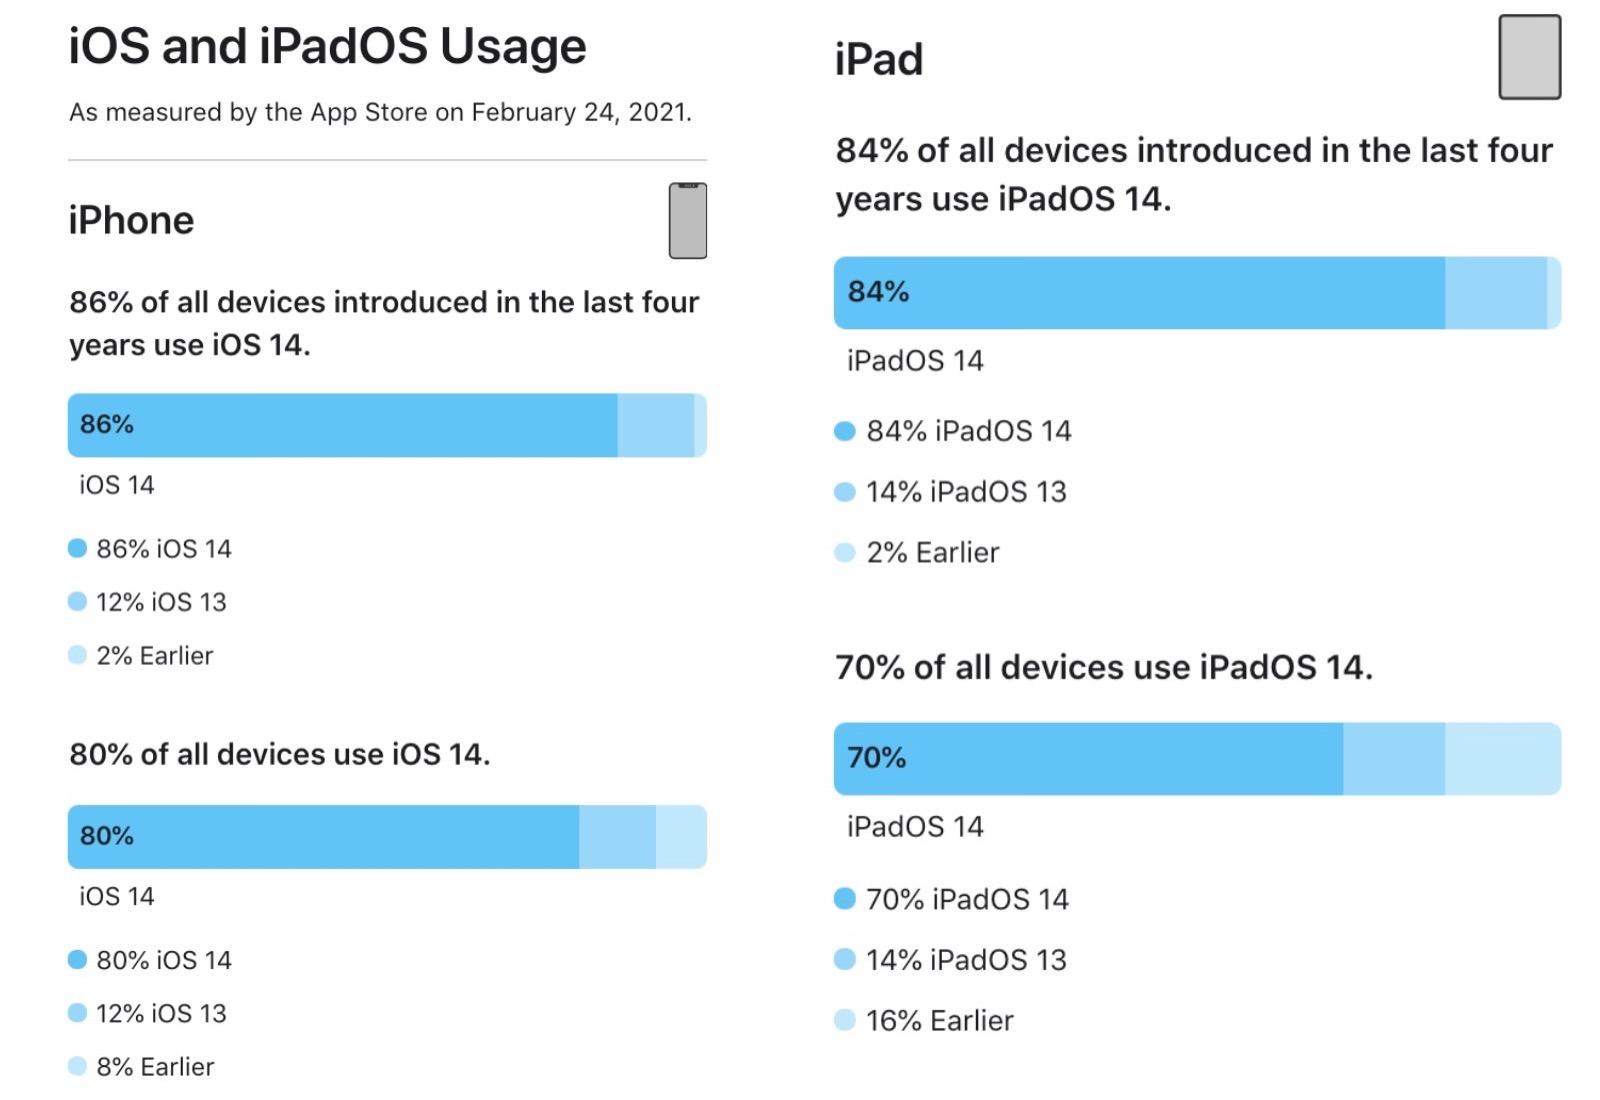 Ios14 iphone and ipad apdoption rate